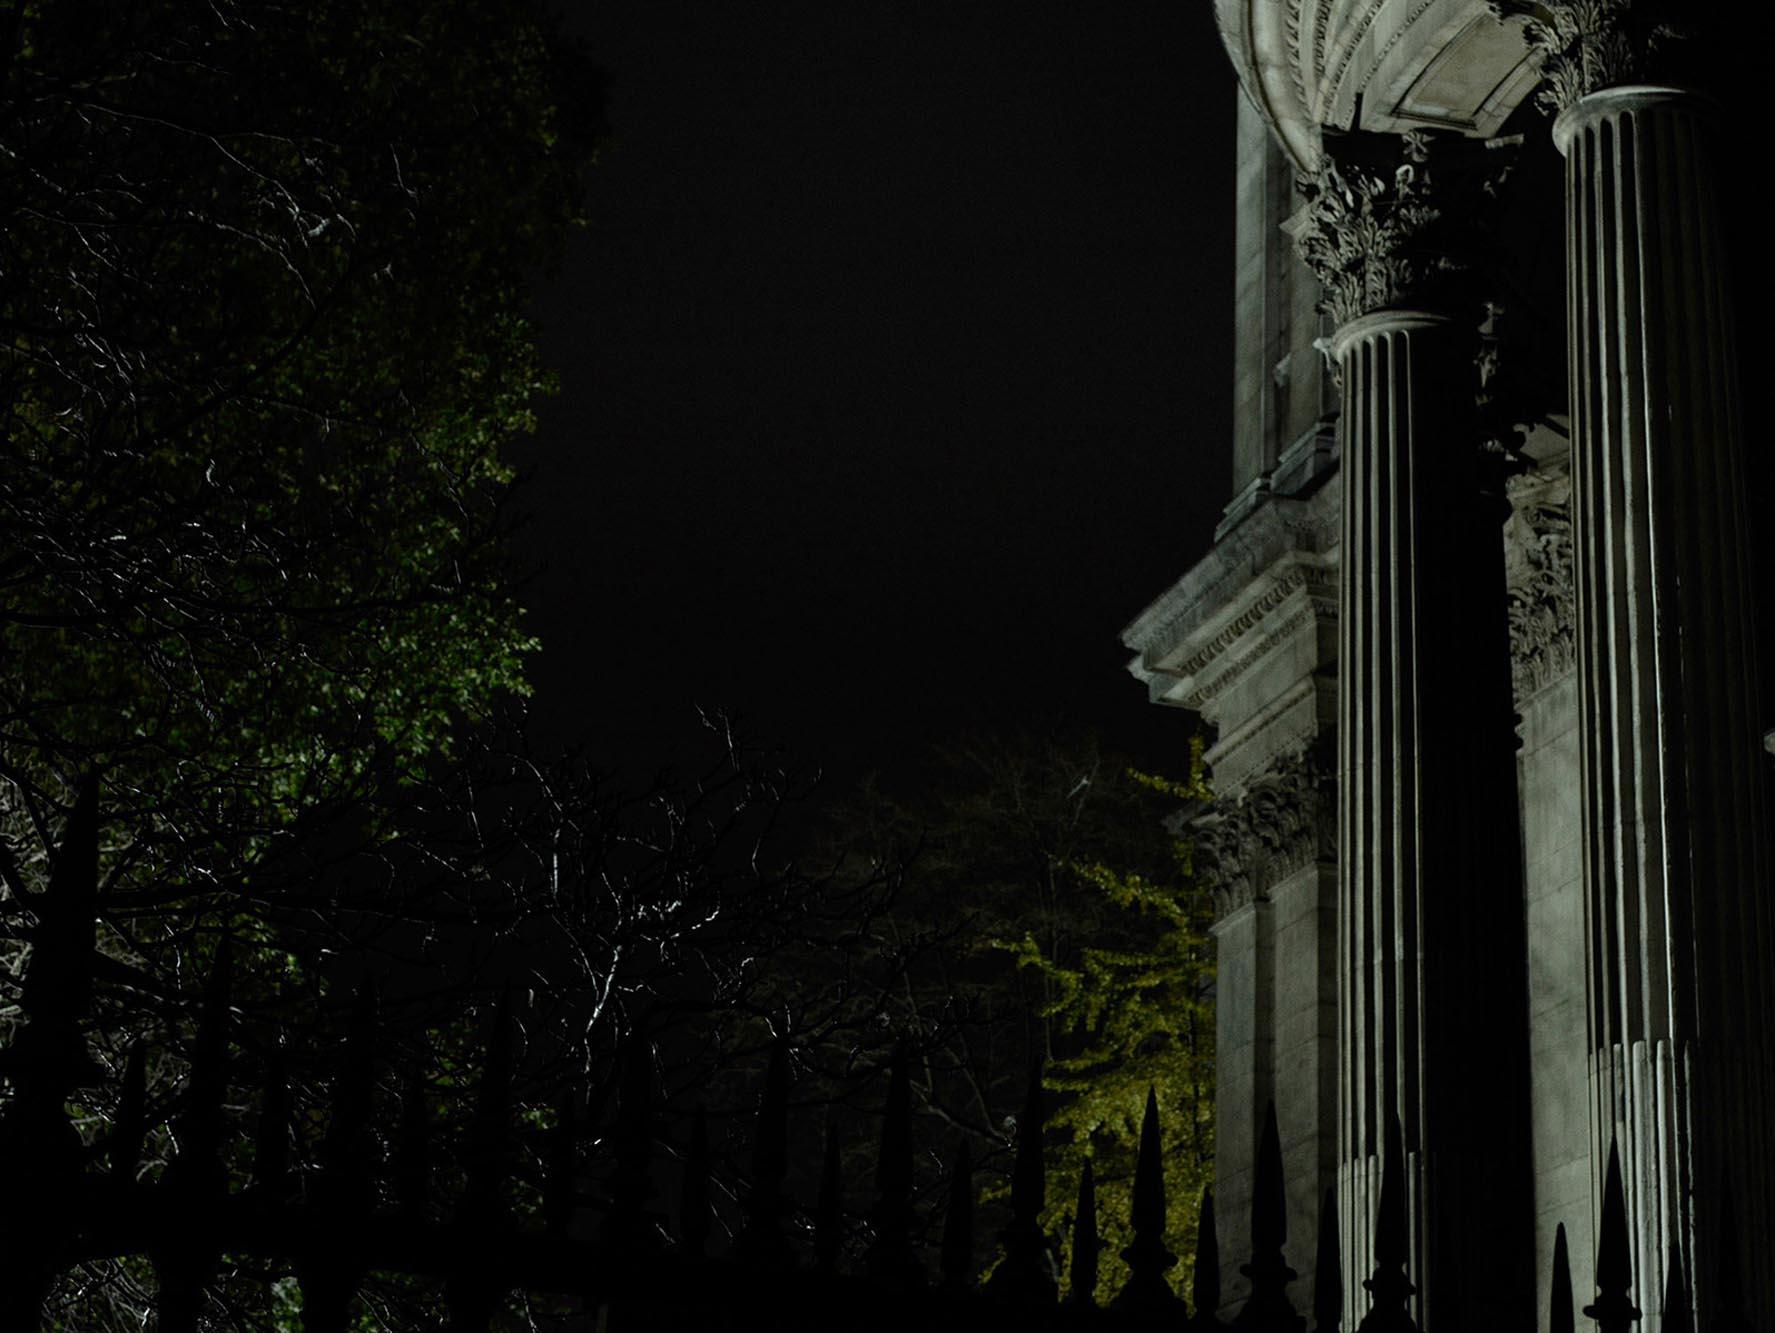 Noel McLaughlin Historic Building at Night